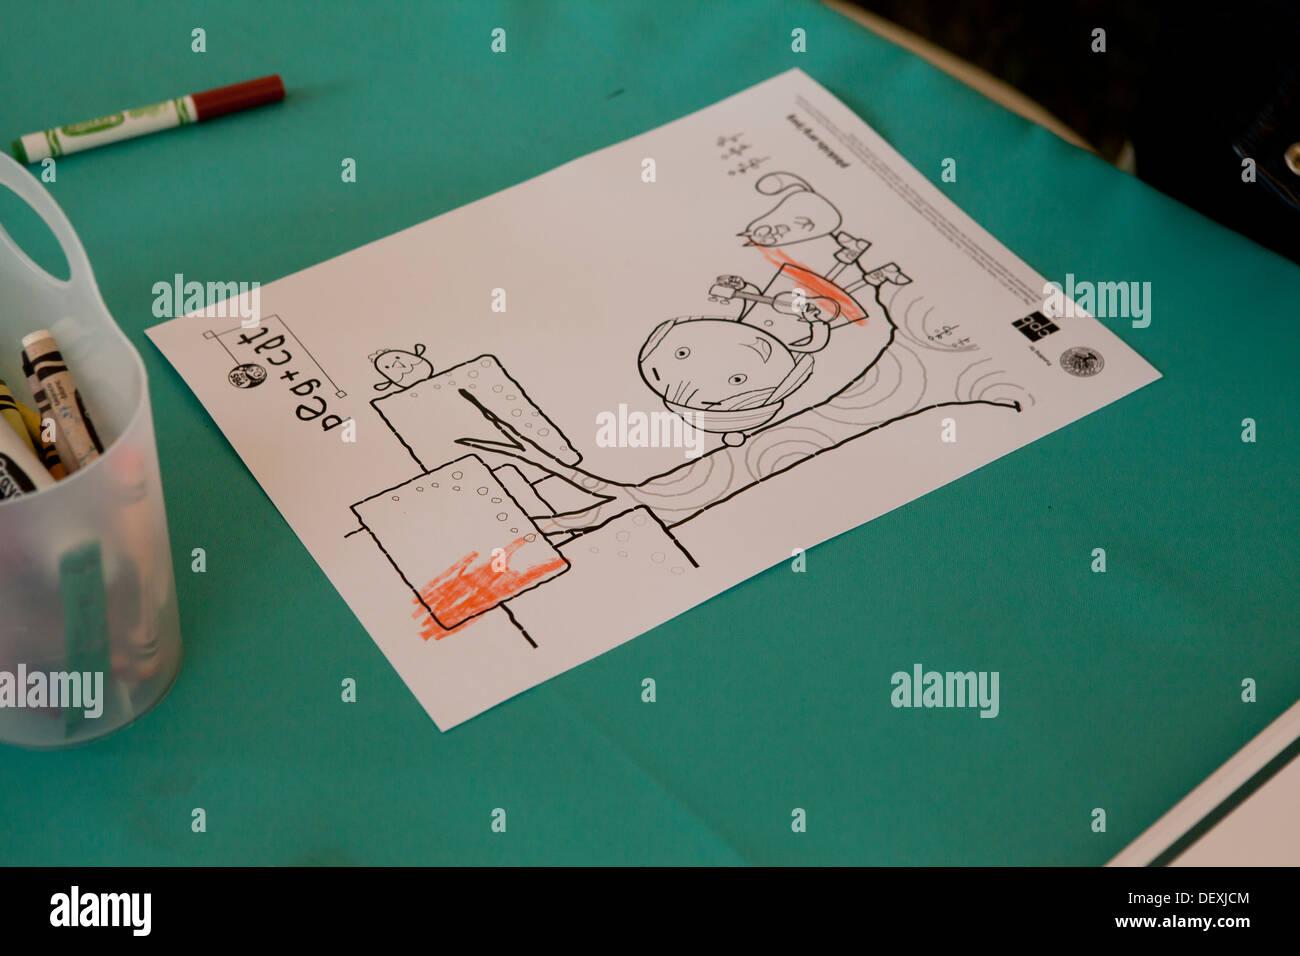 Sheet Coloring Stock Photos & Sheet Coloring Stock Images - Alamy